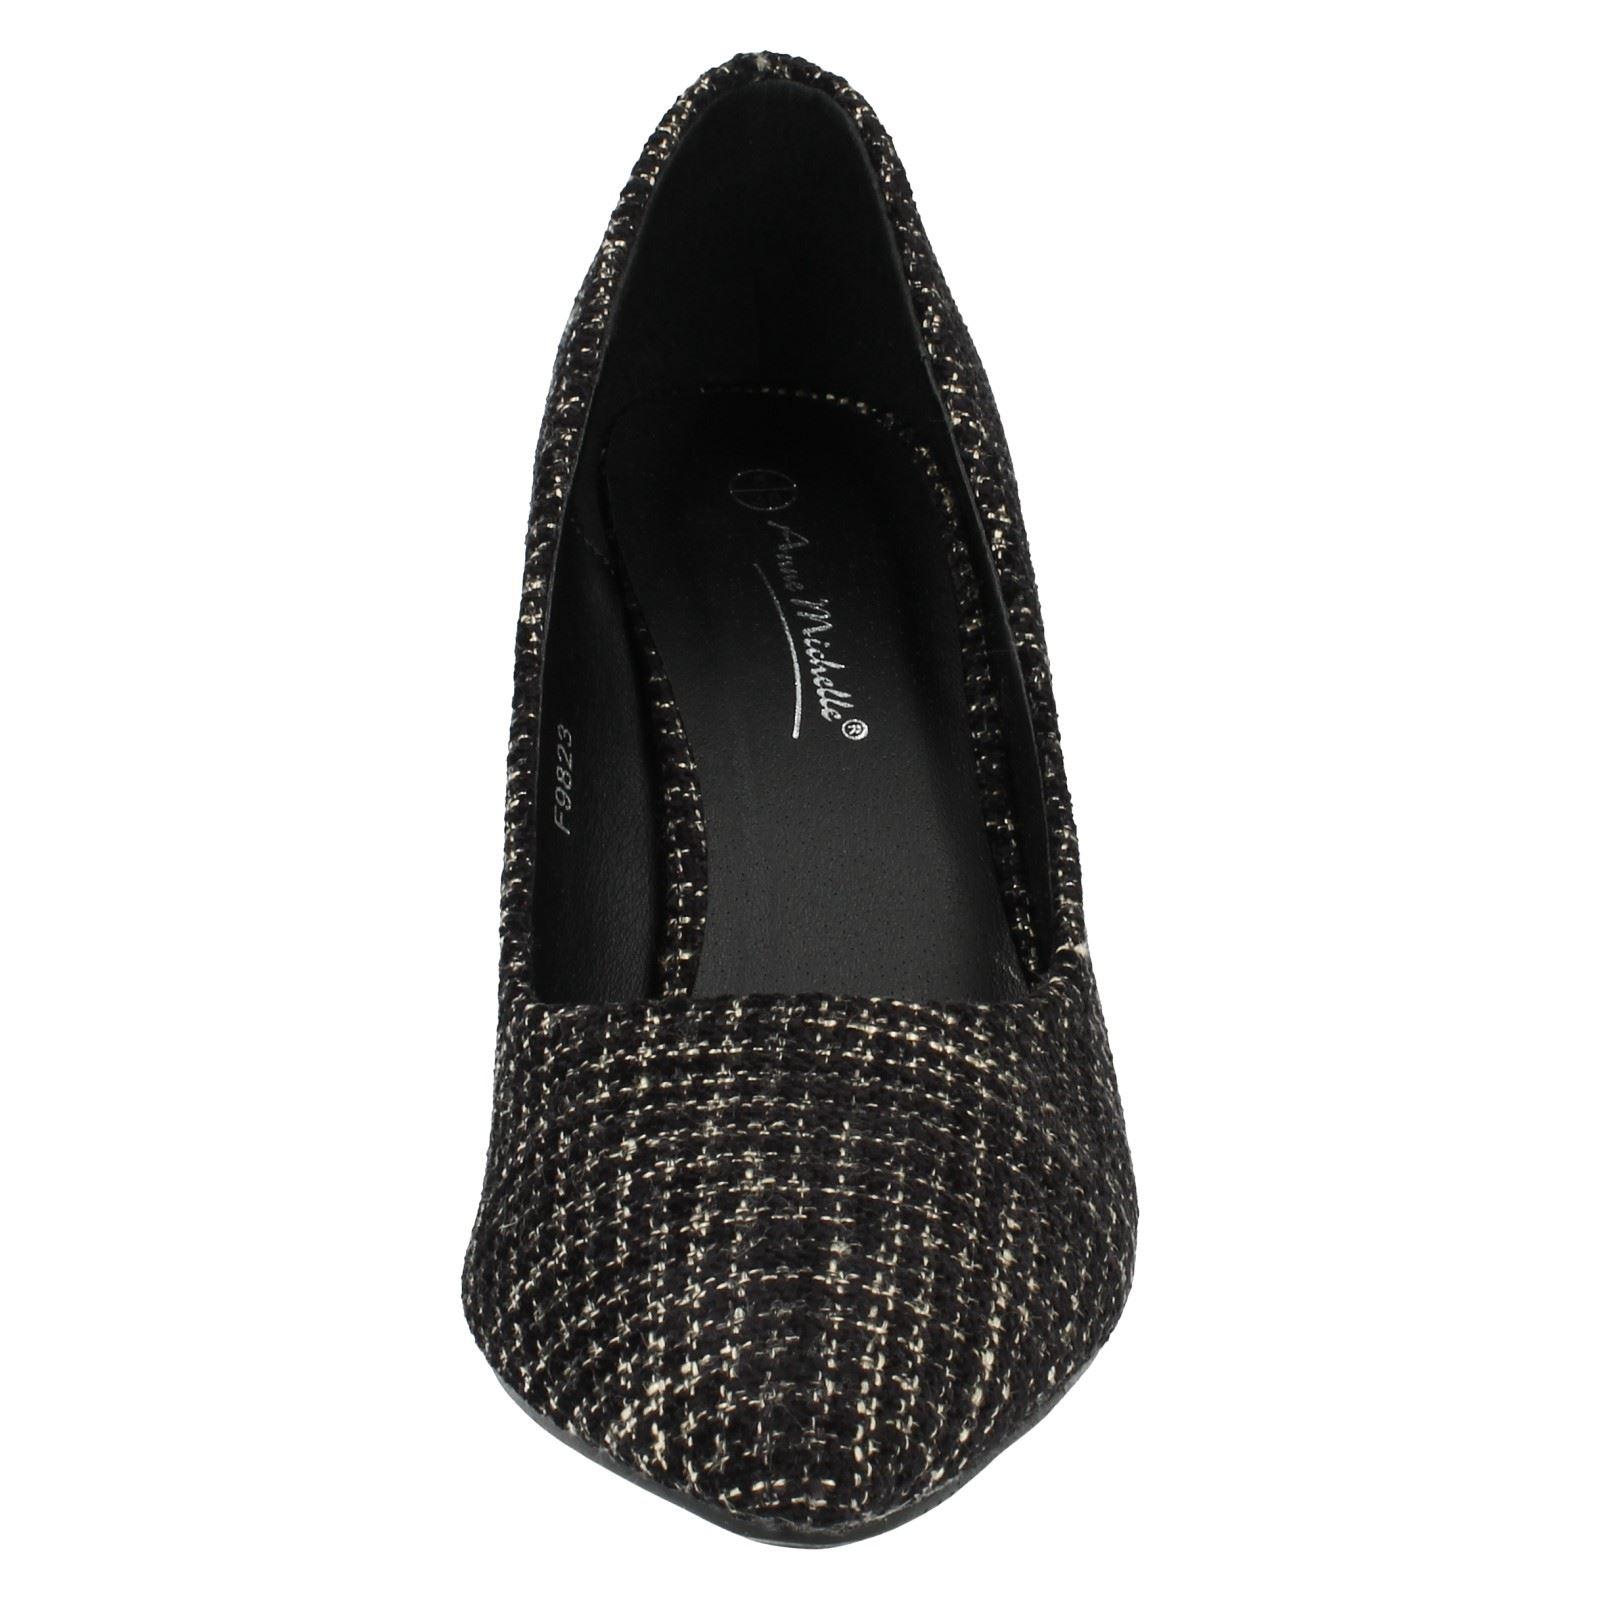 Señoras Anne Michelle Zapatos Tenis Etiqueta f9823